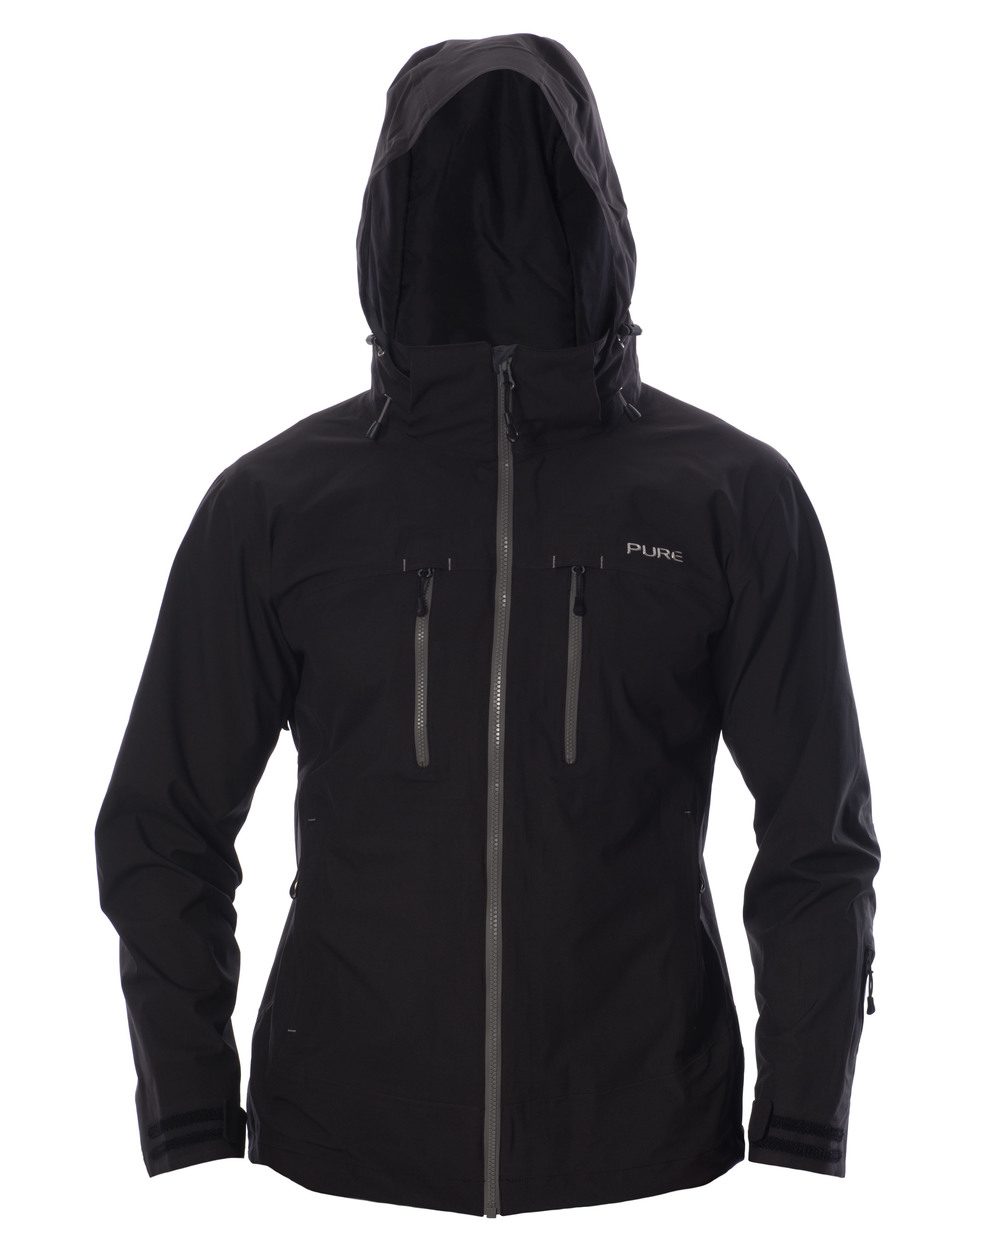 Everest Men's Jacket - Black / Ebony Zips